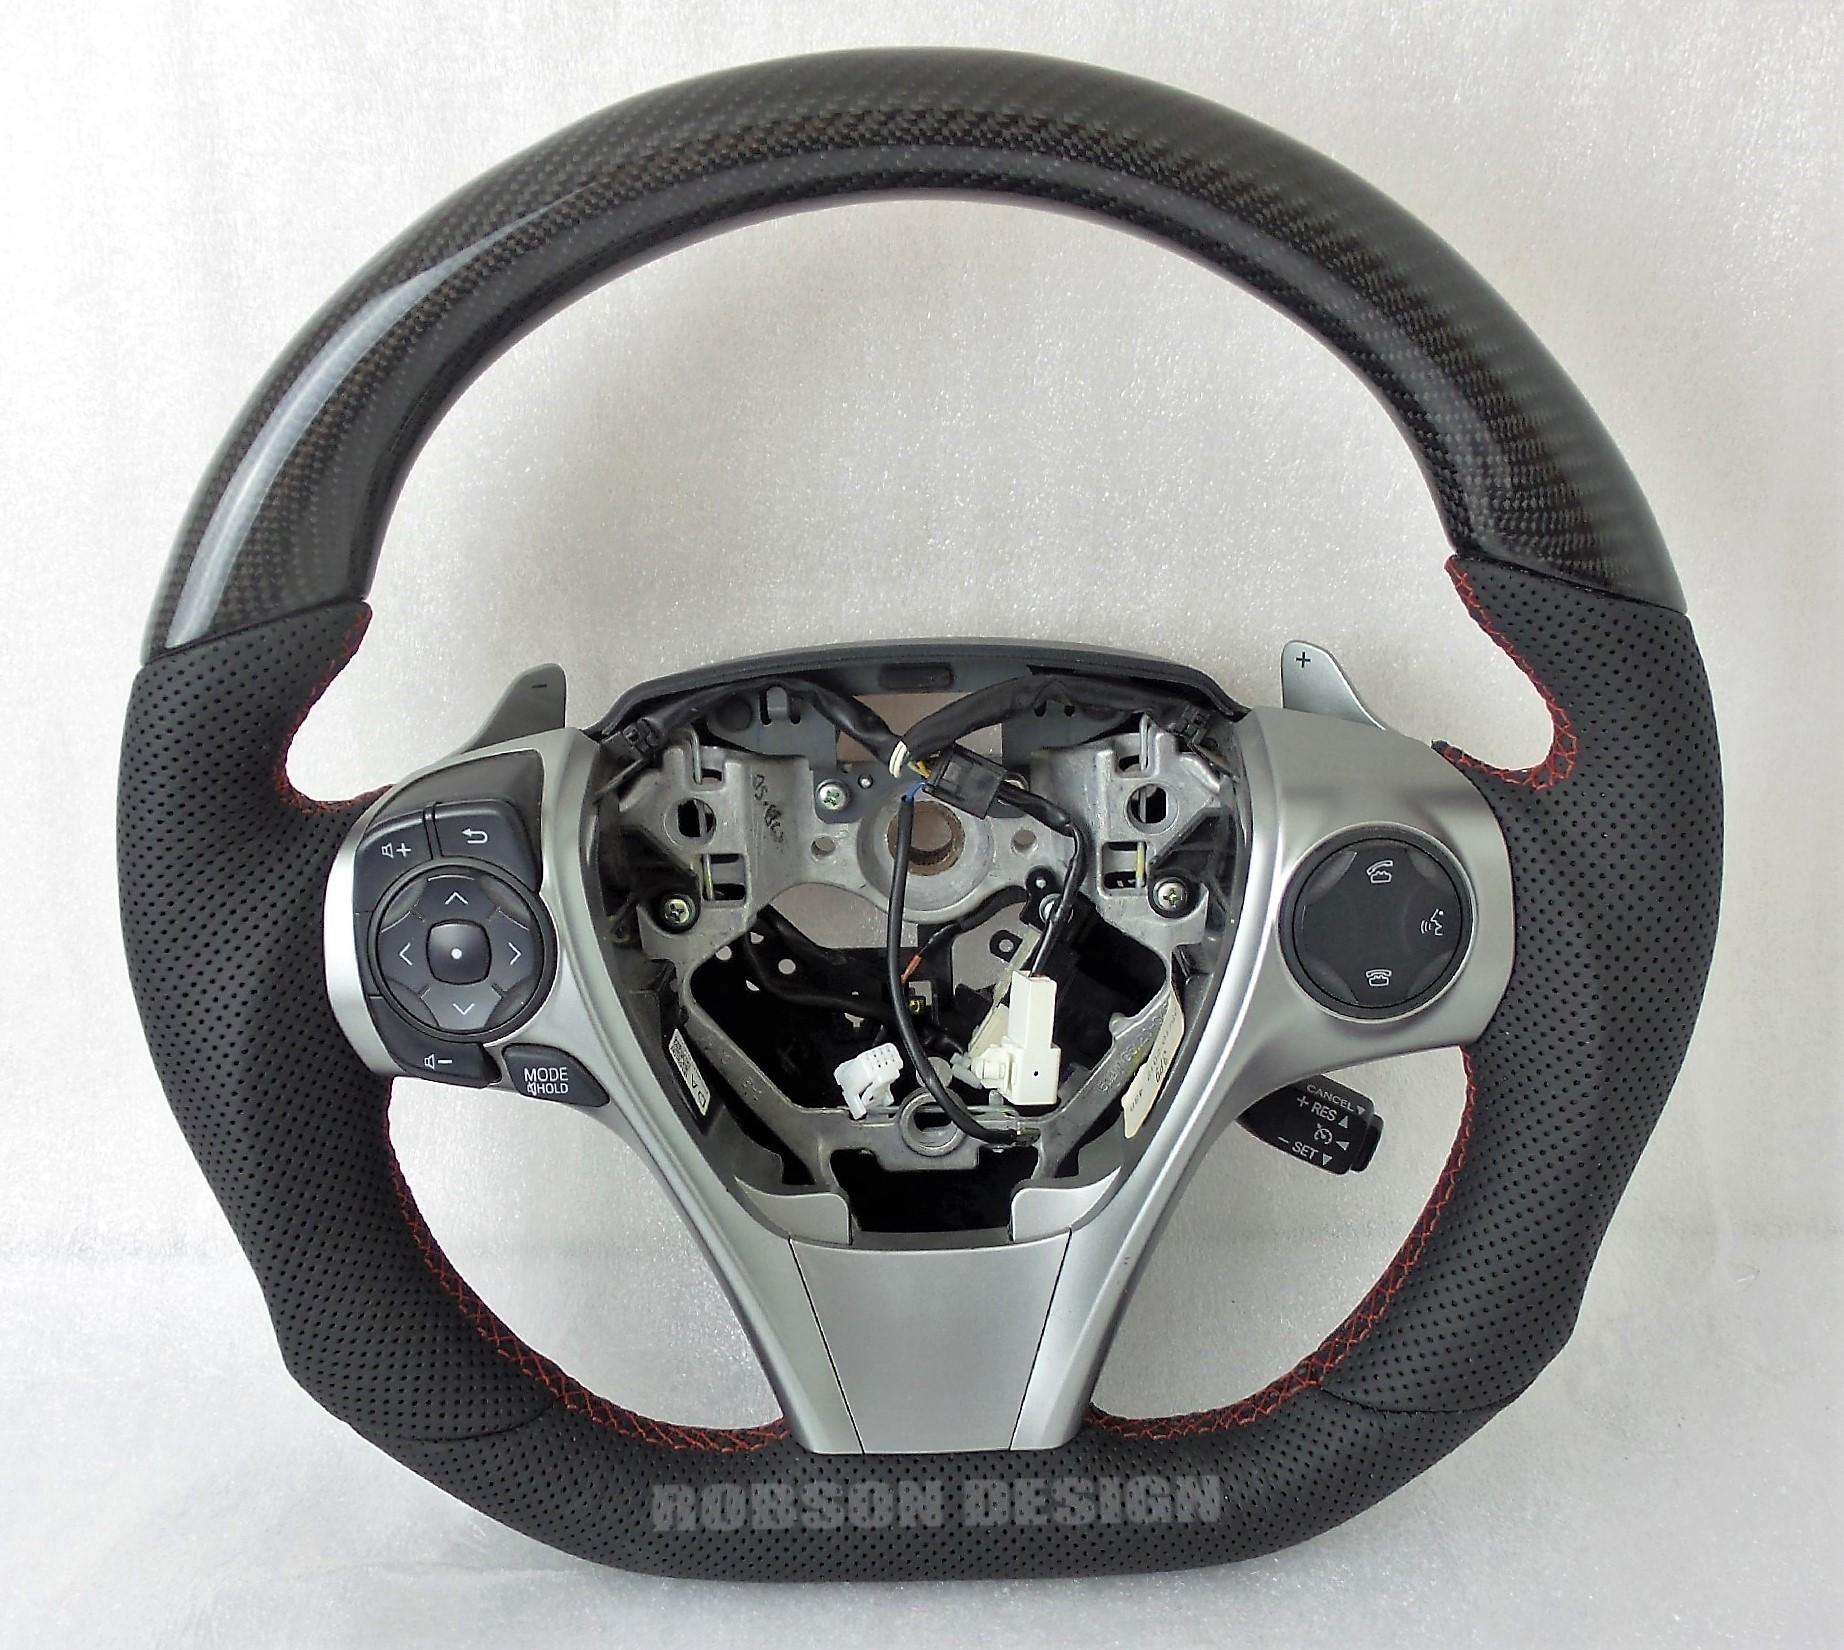 Toyota Camry Carbon Fiber Steering Wheel